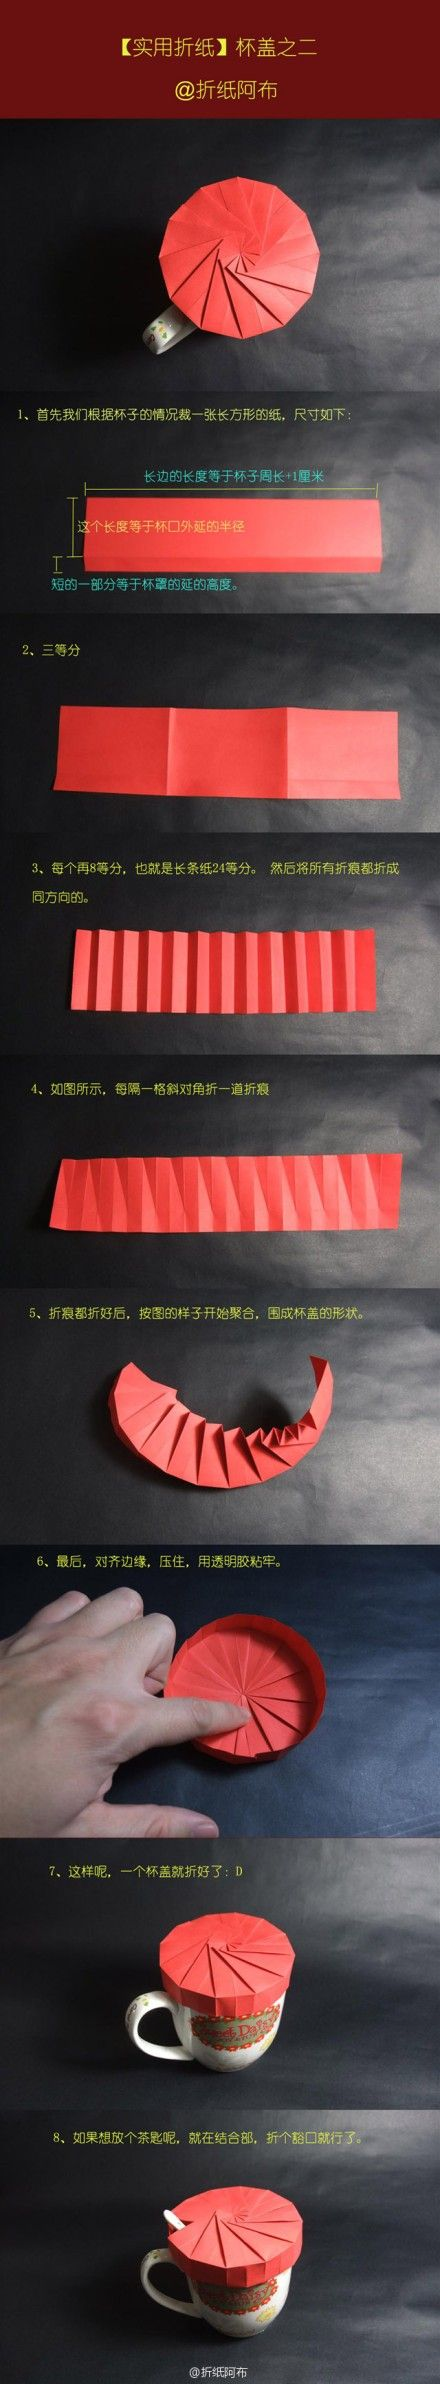 Origami-Lid.jpg 440×2,384 ピクセル